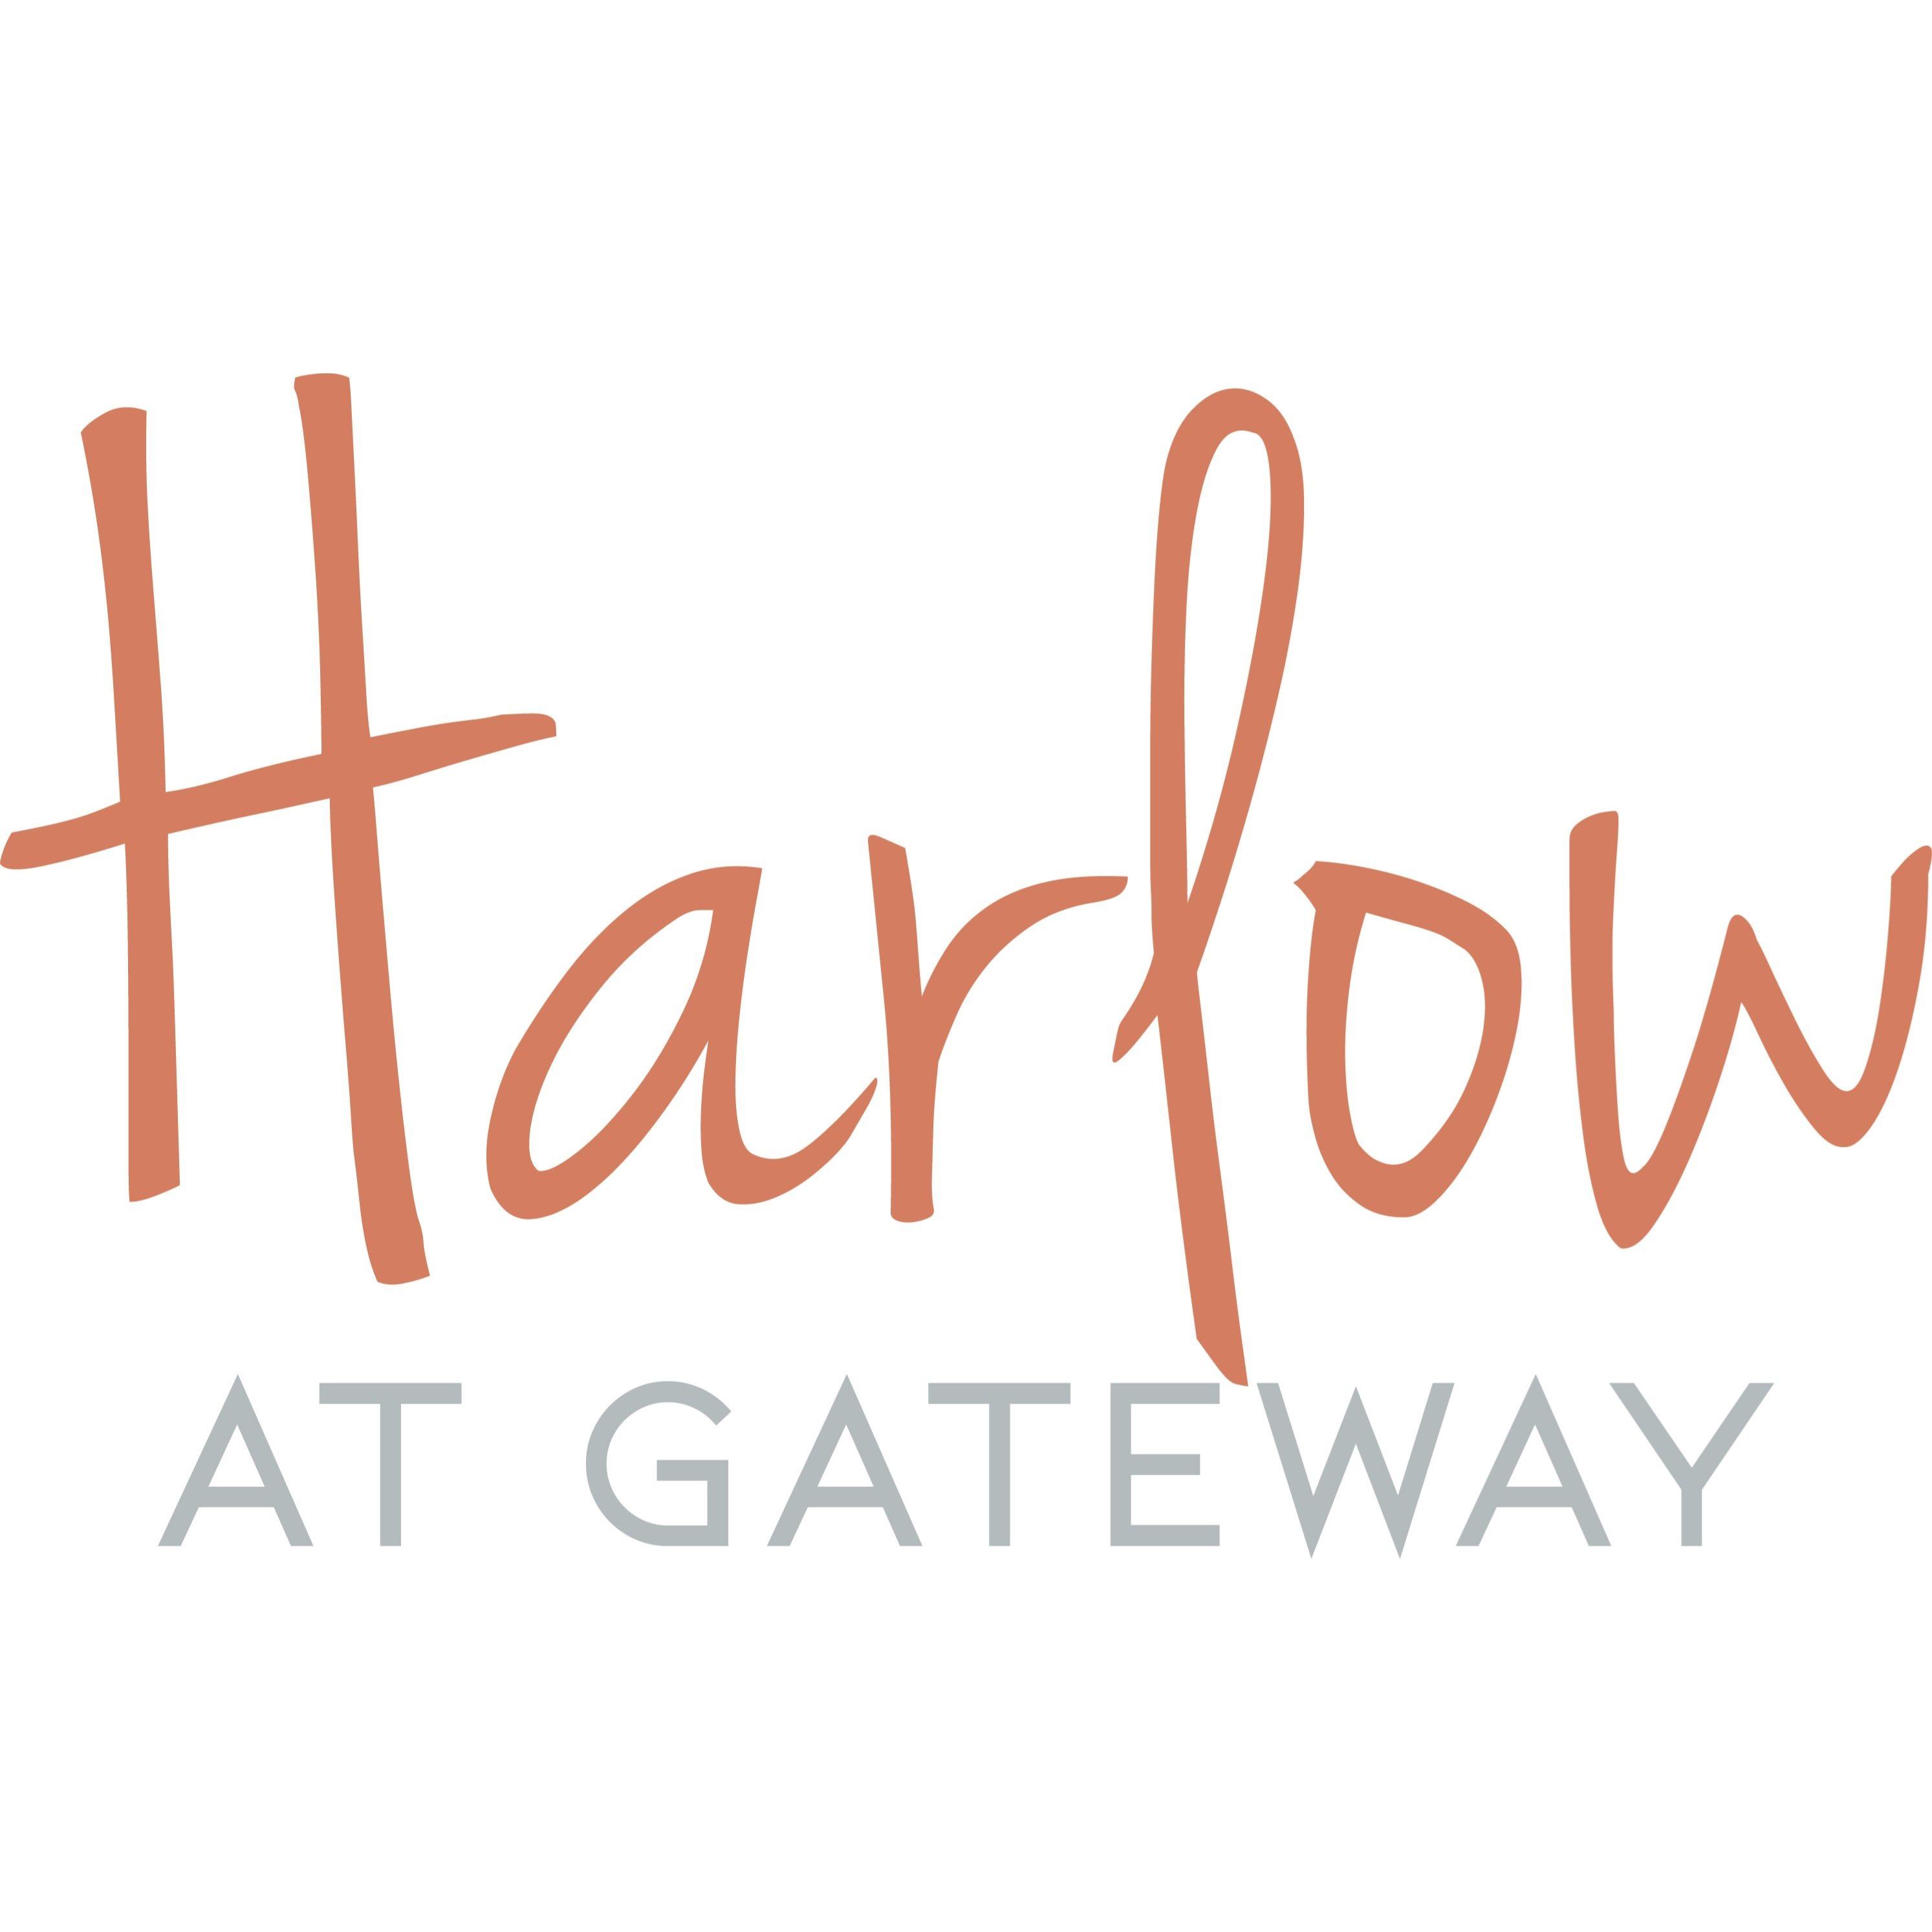 Harlow at Gateway Apartments - St. Petersburg, FL 33702 - (727)314-3785 | ShowMeLocal.com